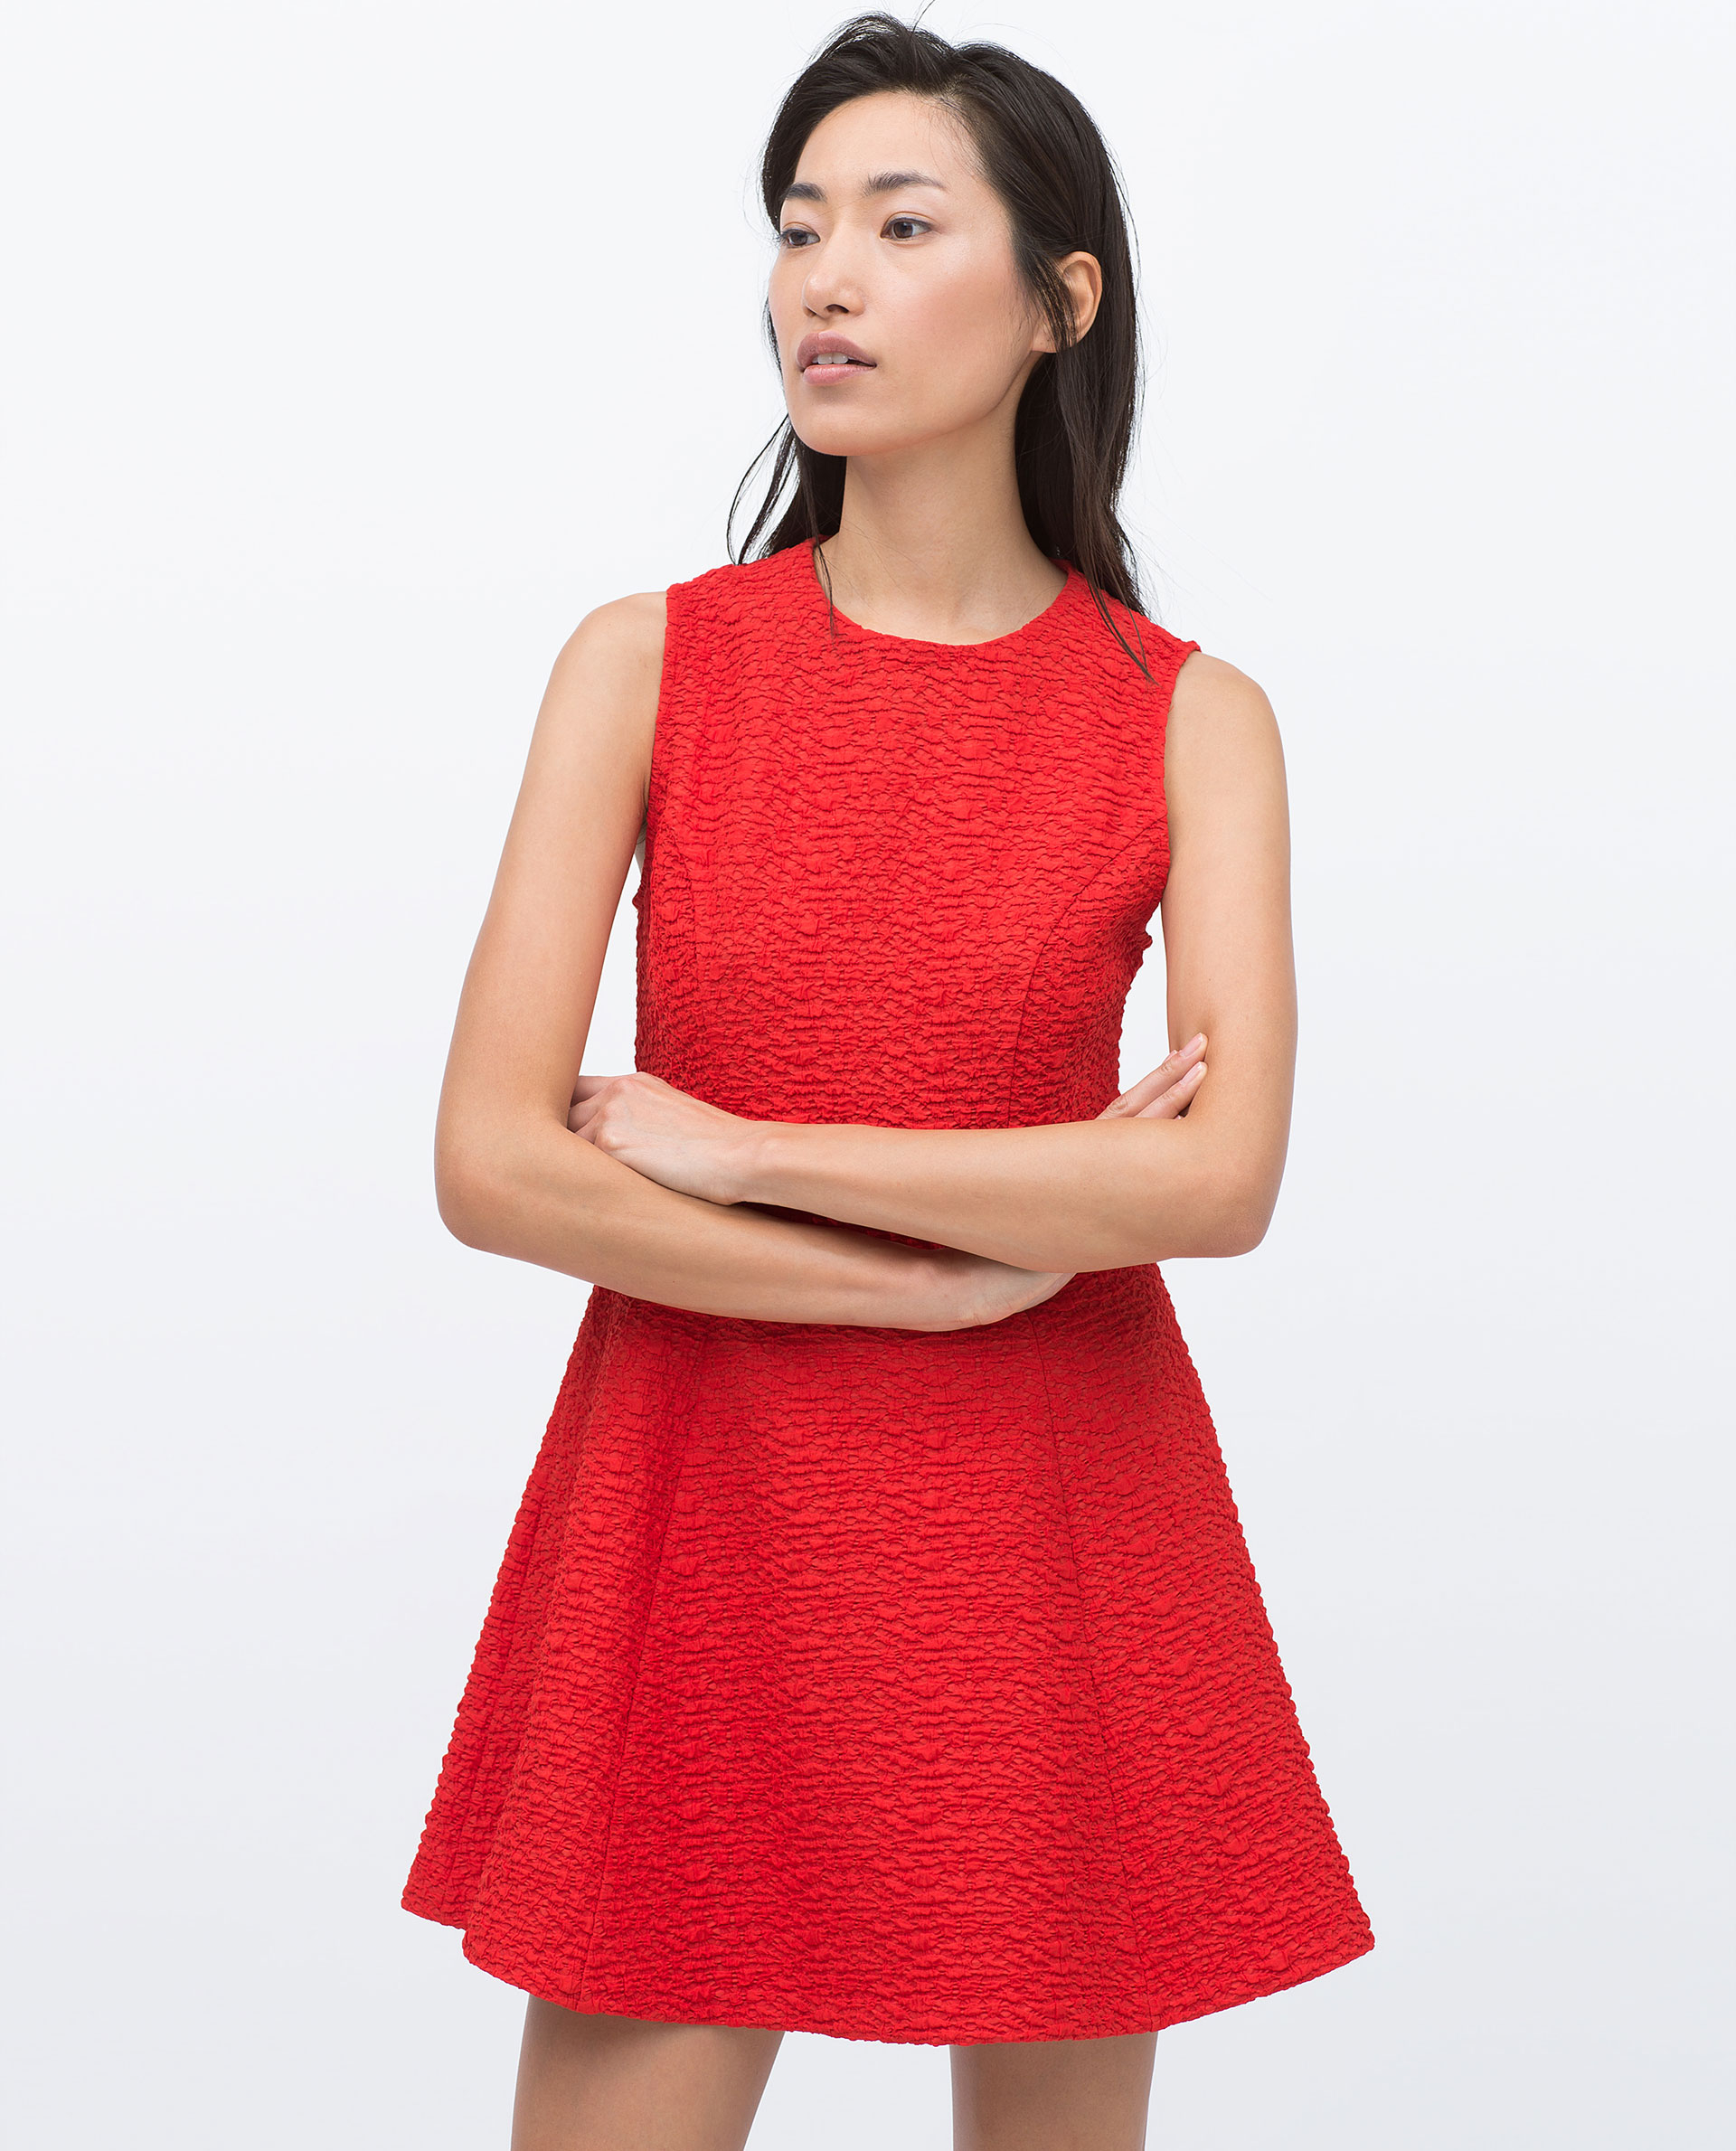 Zara Jacquard Dress With Pleats Jacquard Dress With Pleats in Red ...